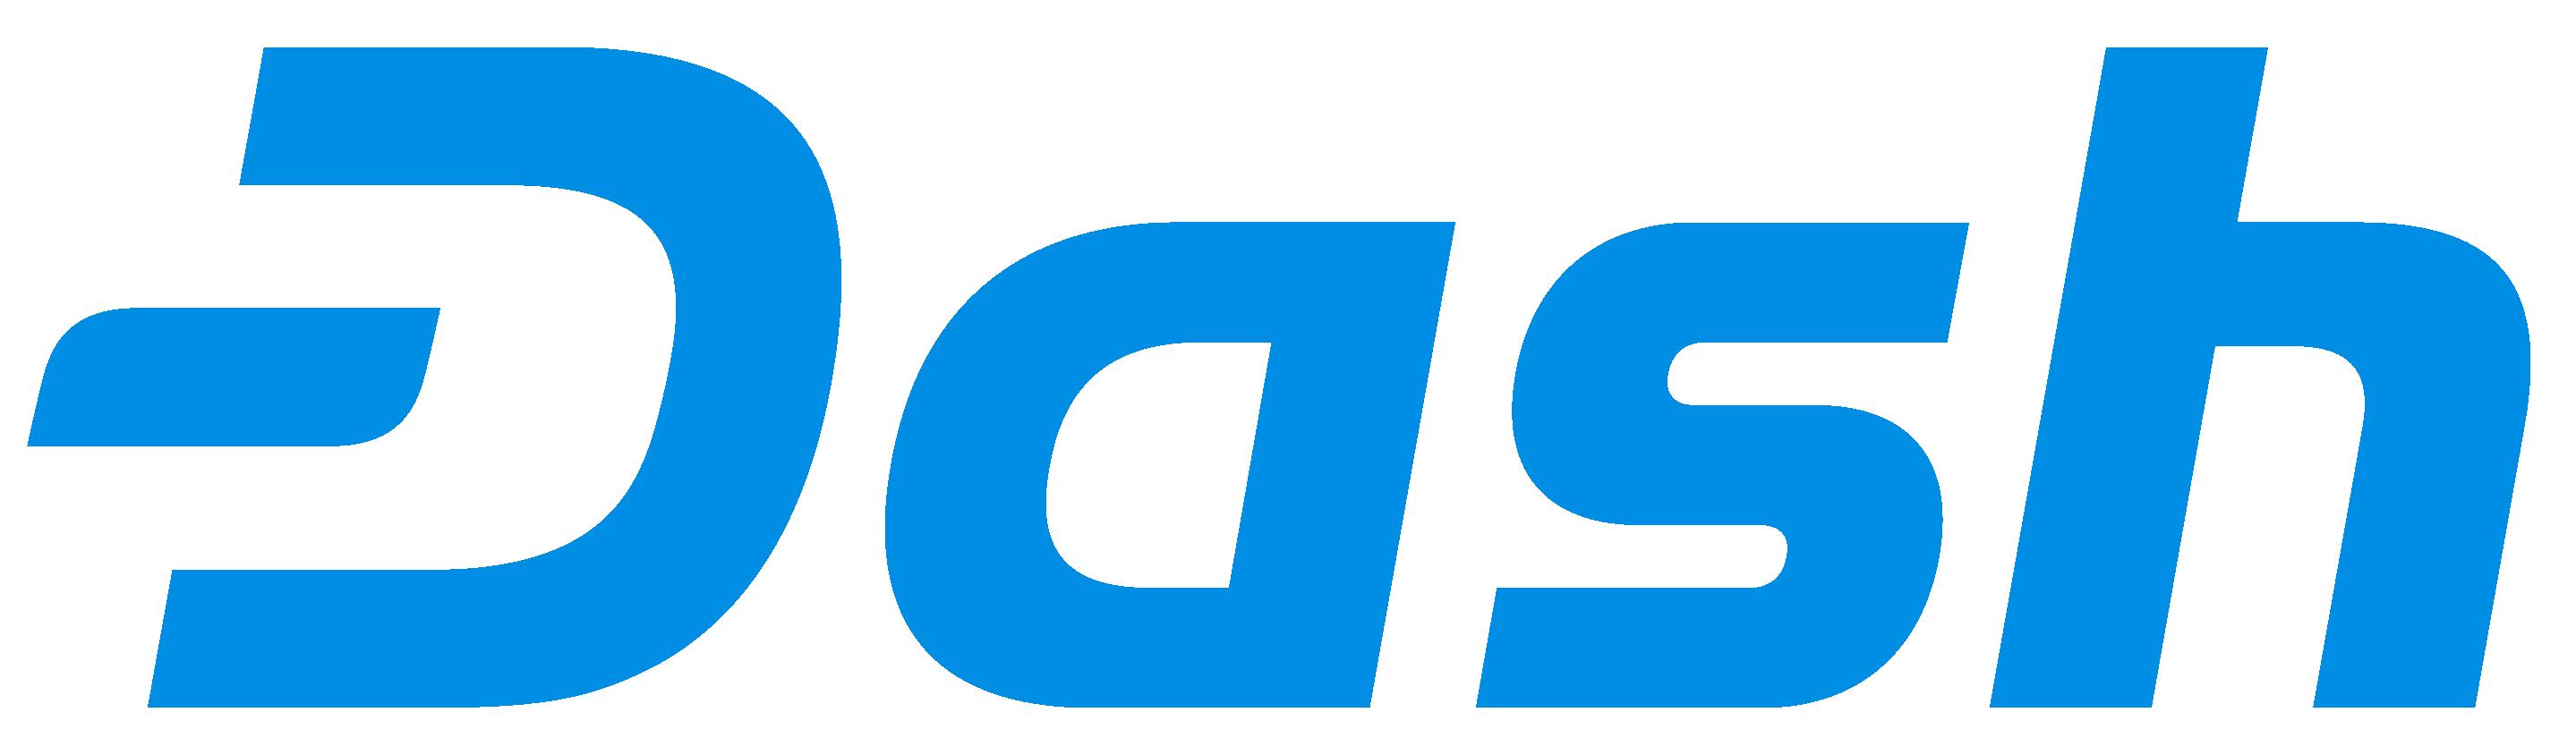 Dash Wallet logo